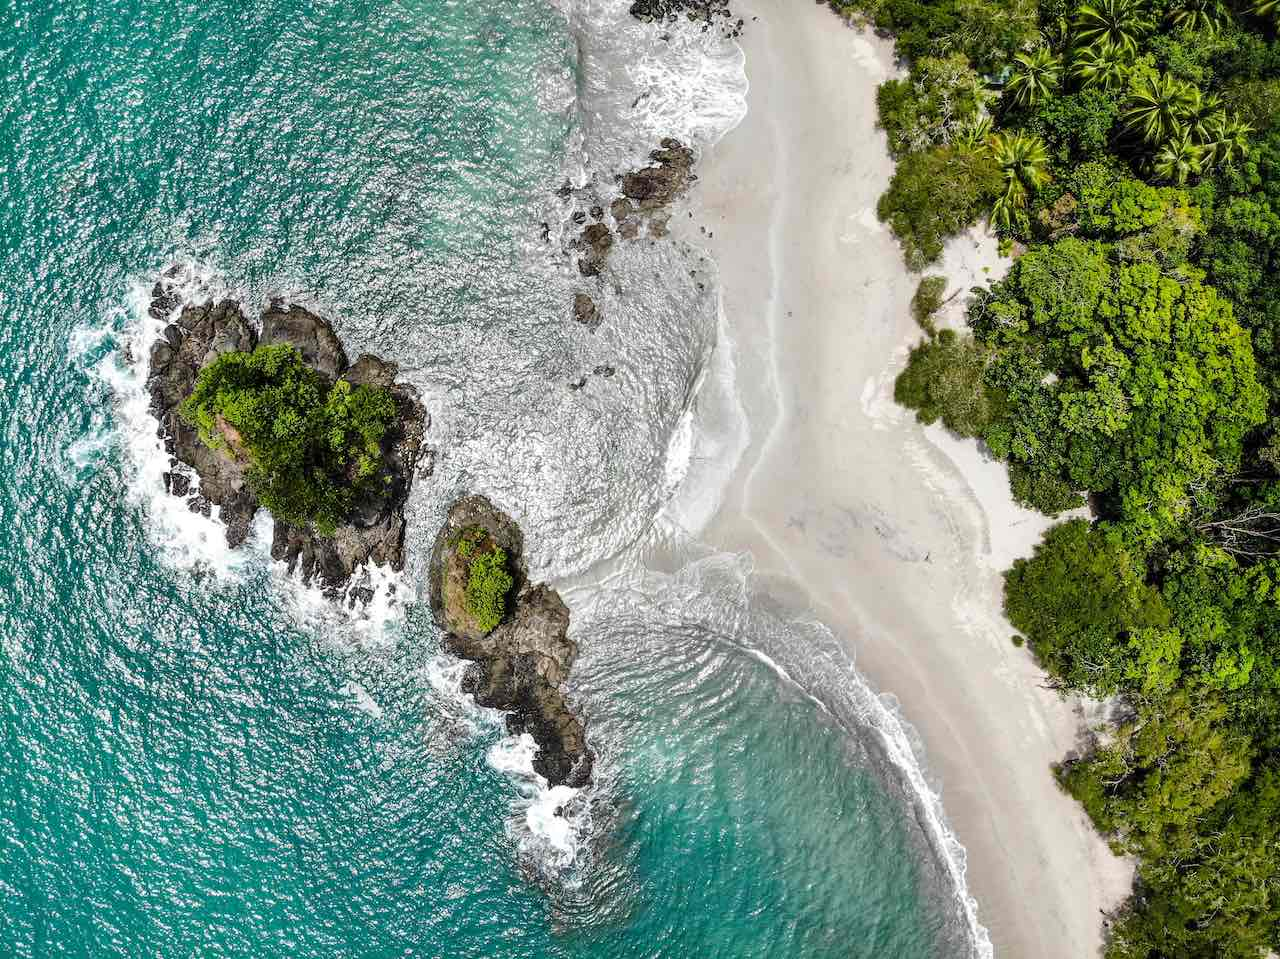 Costa Rica Credit Atanas Malamov